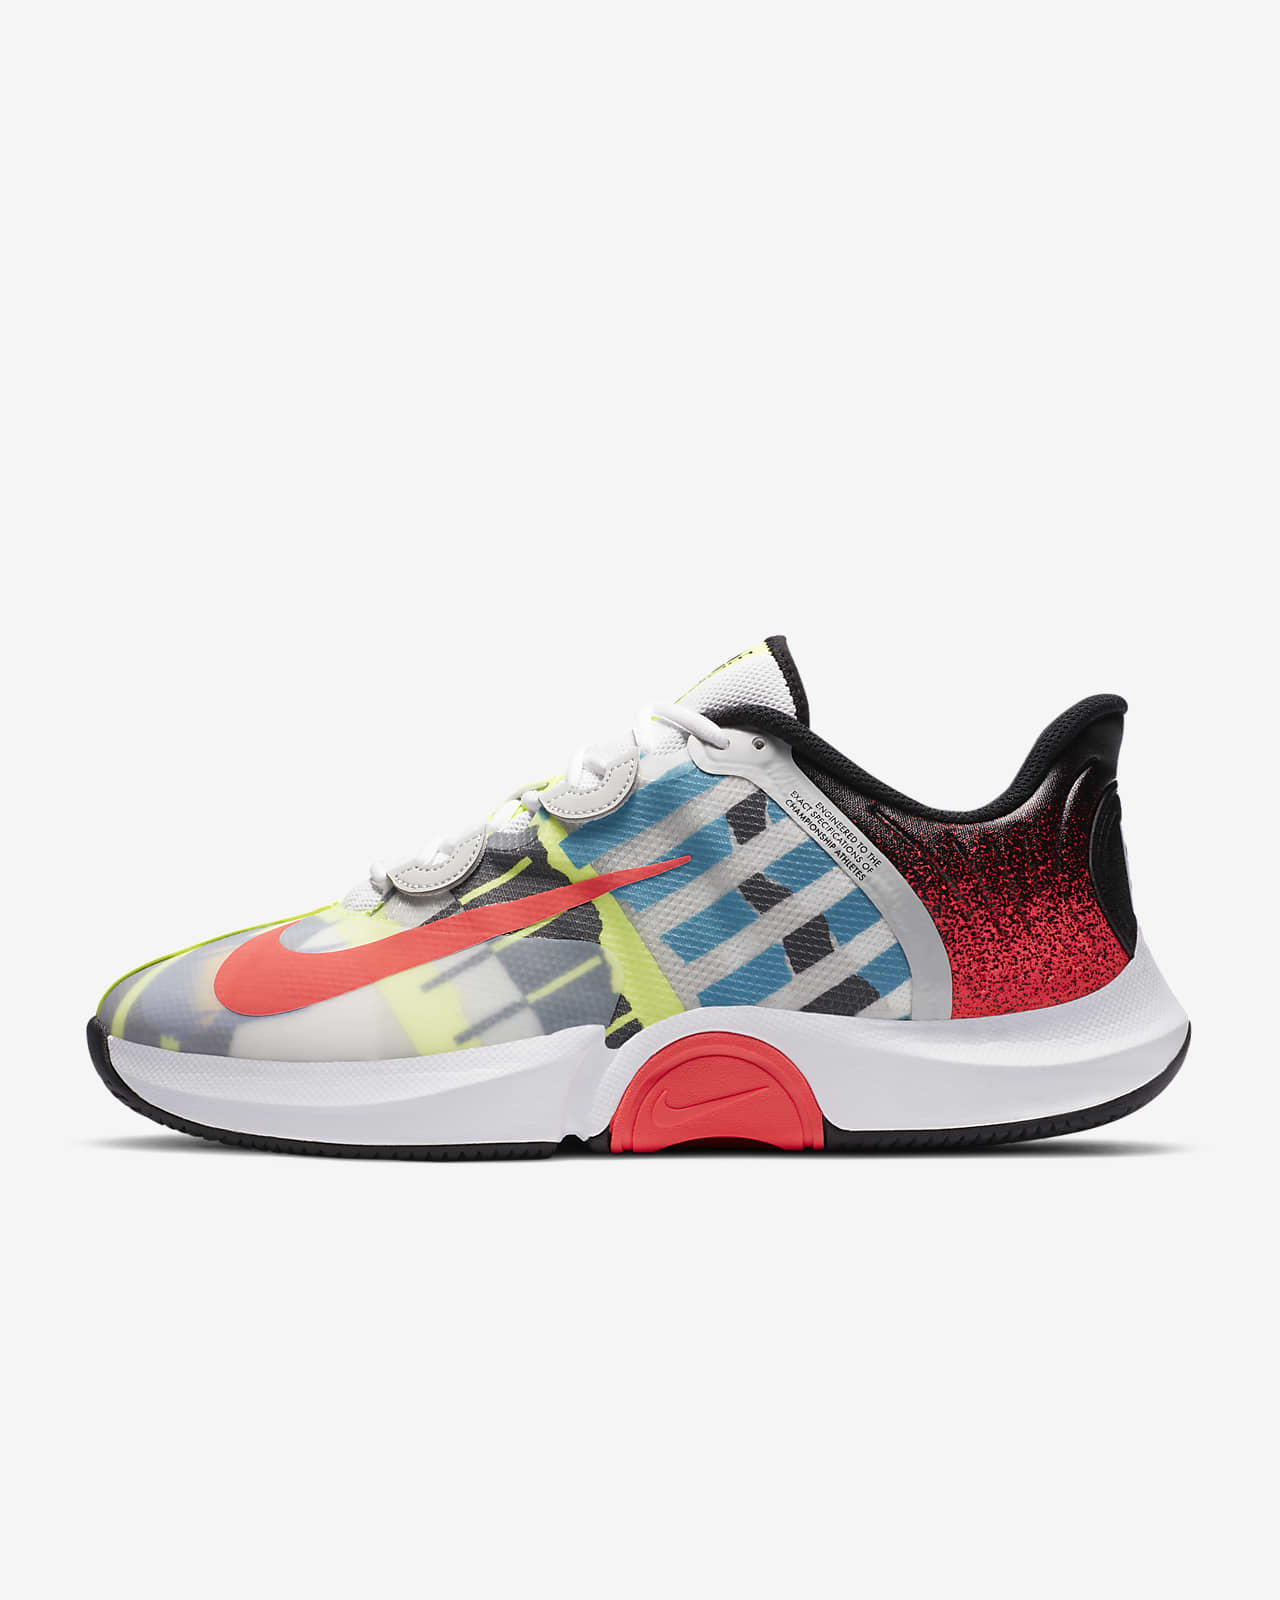 Nike Air Zoom GP Turbo HC 男子硬地球场网球鞋